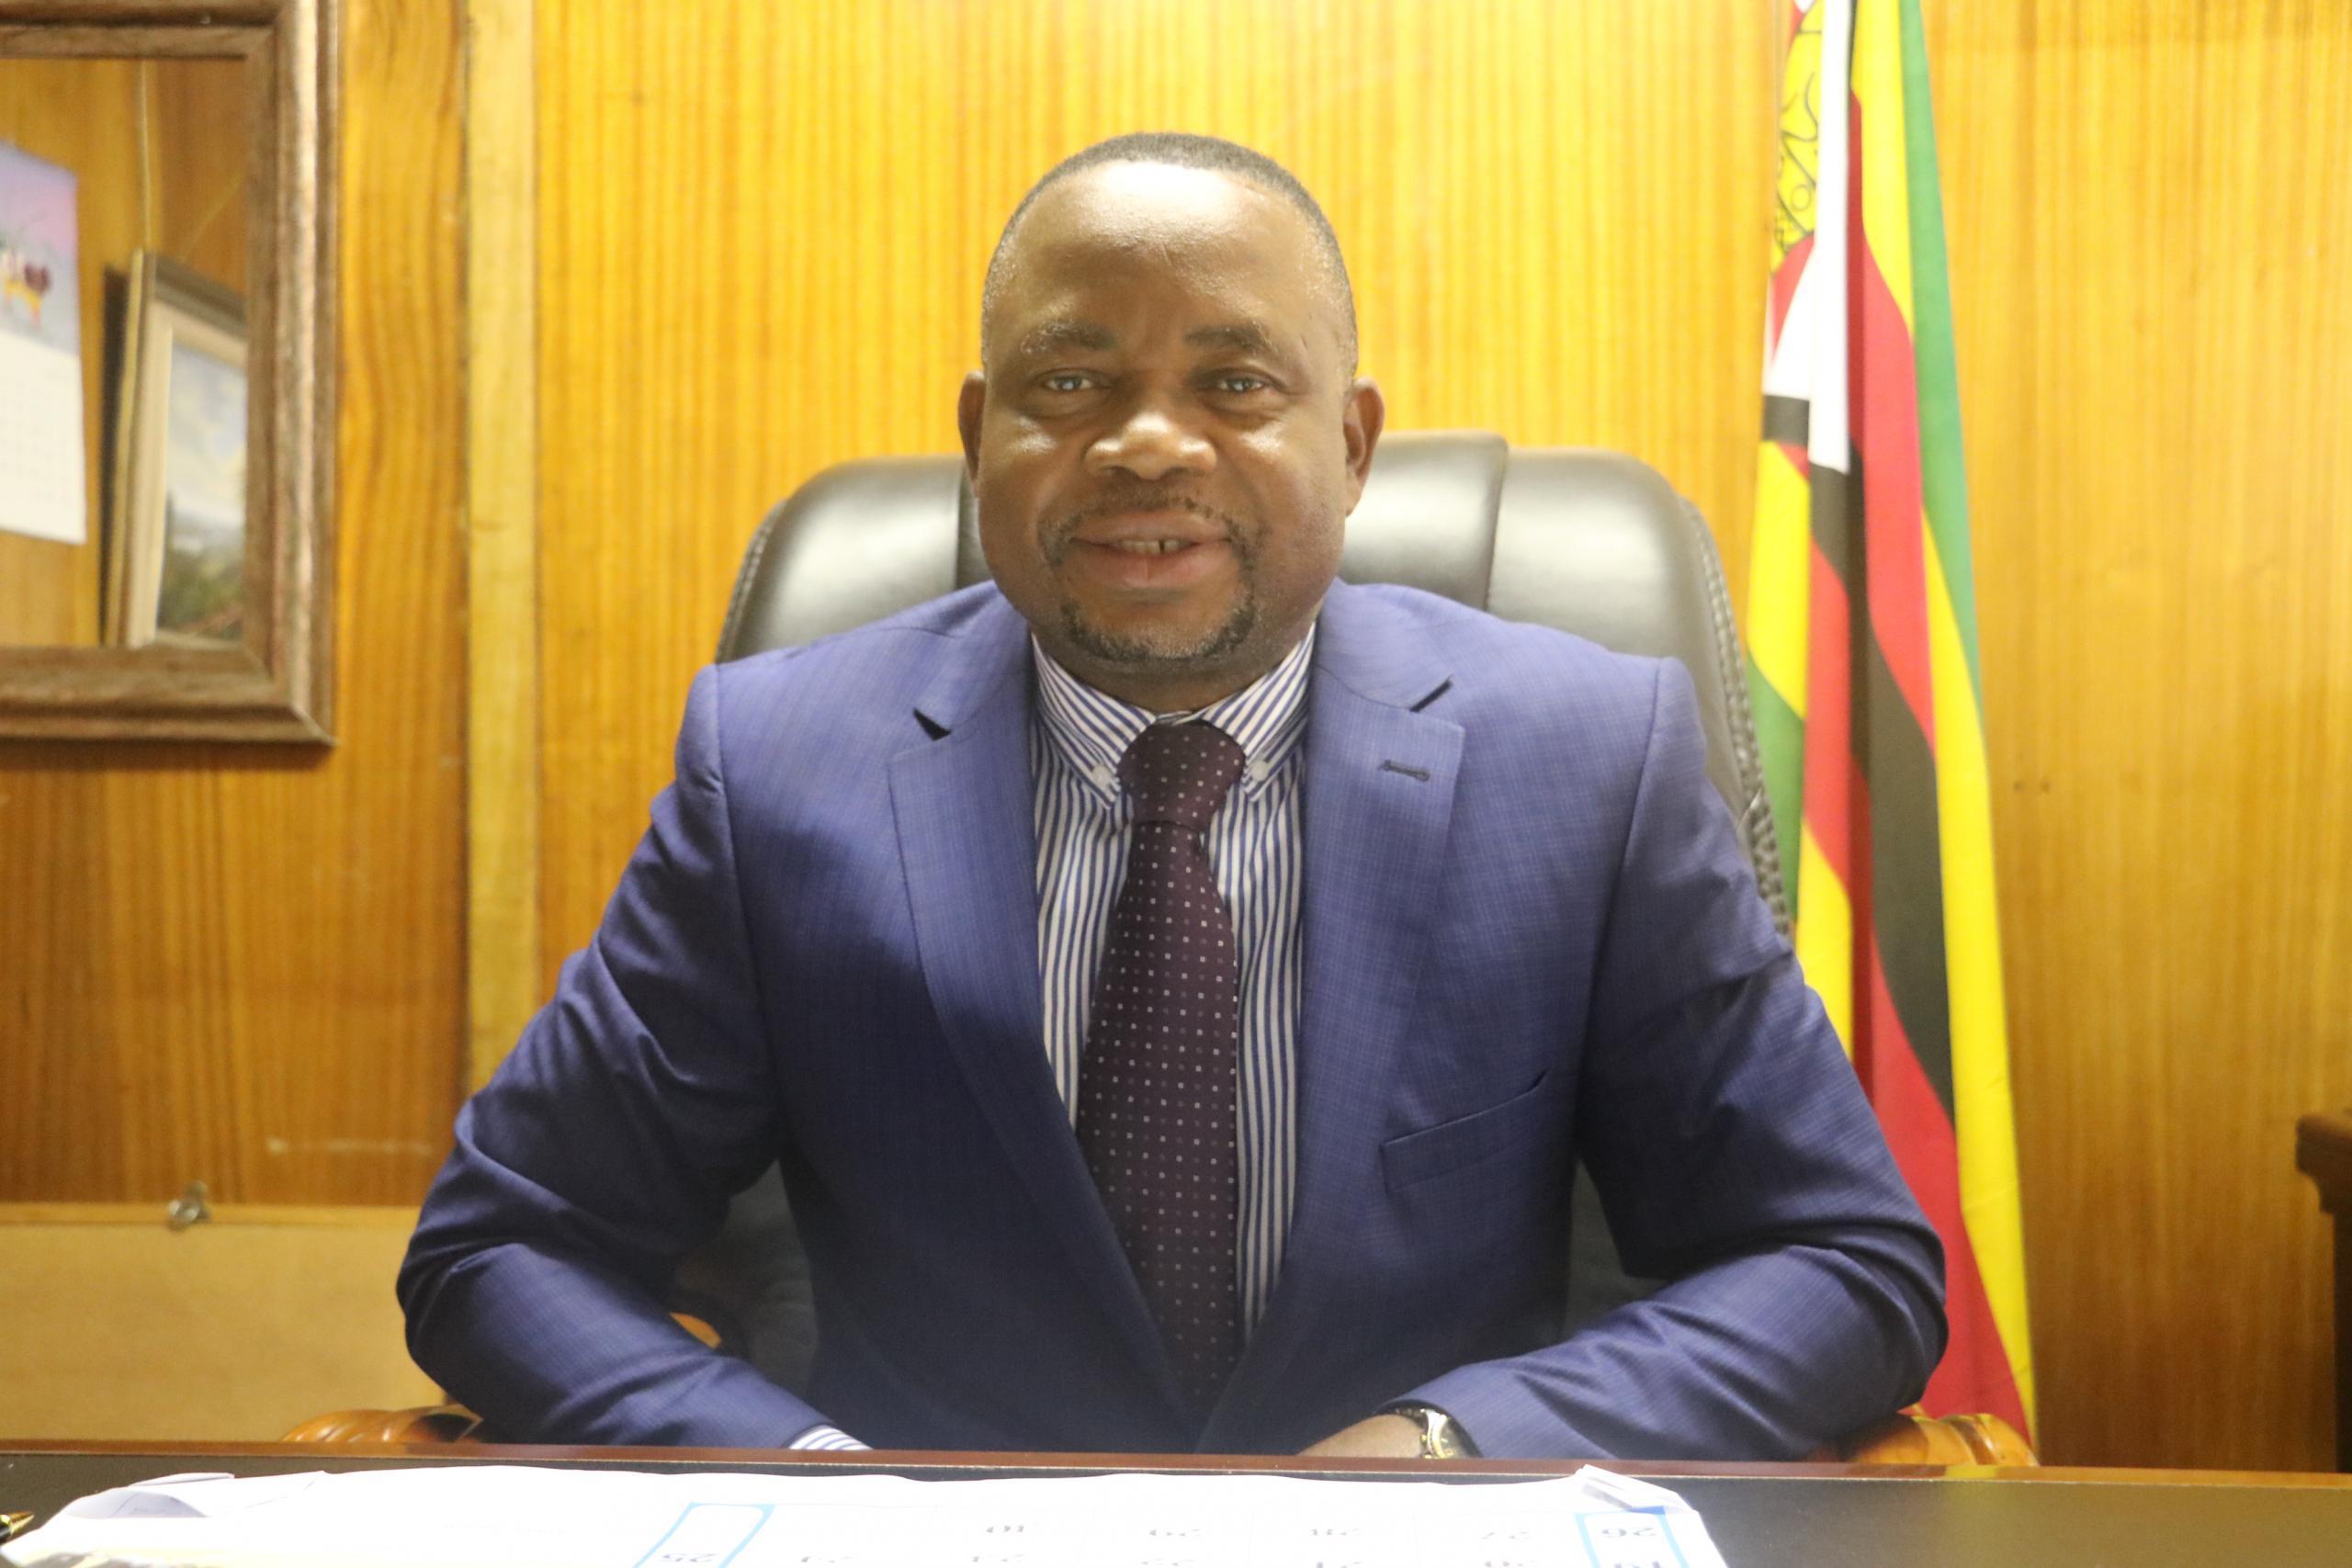 Govt Extends Payment Of Civil Servants' US$75 COVID-19 Allowance